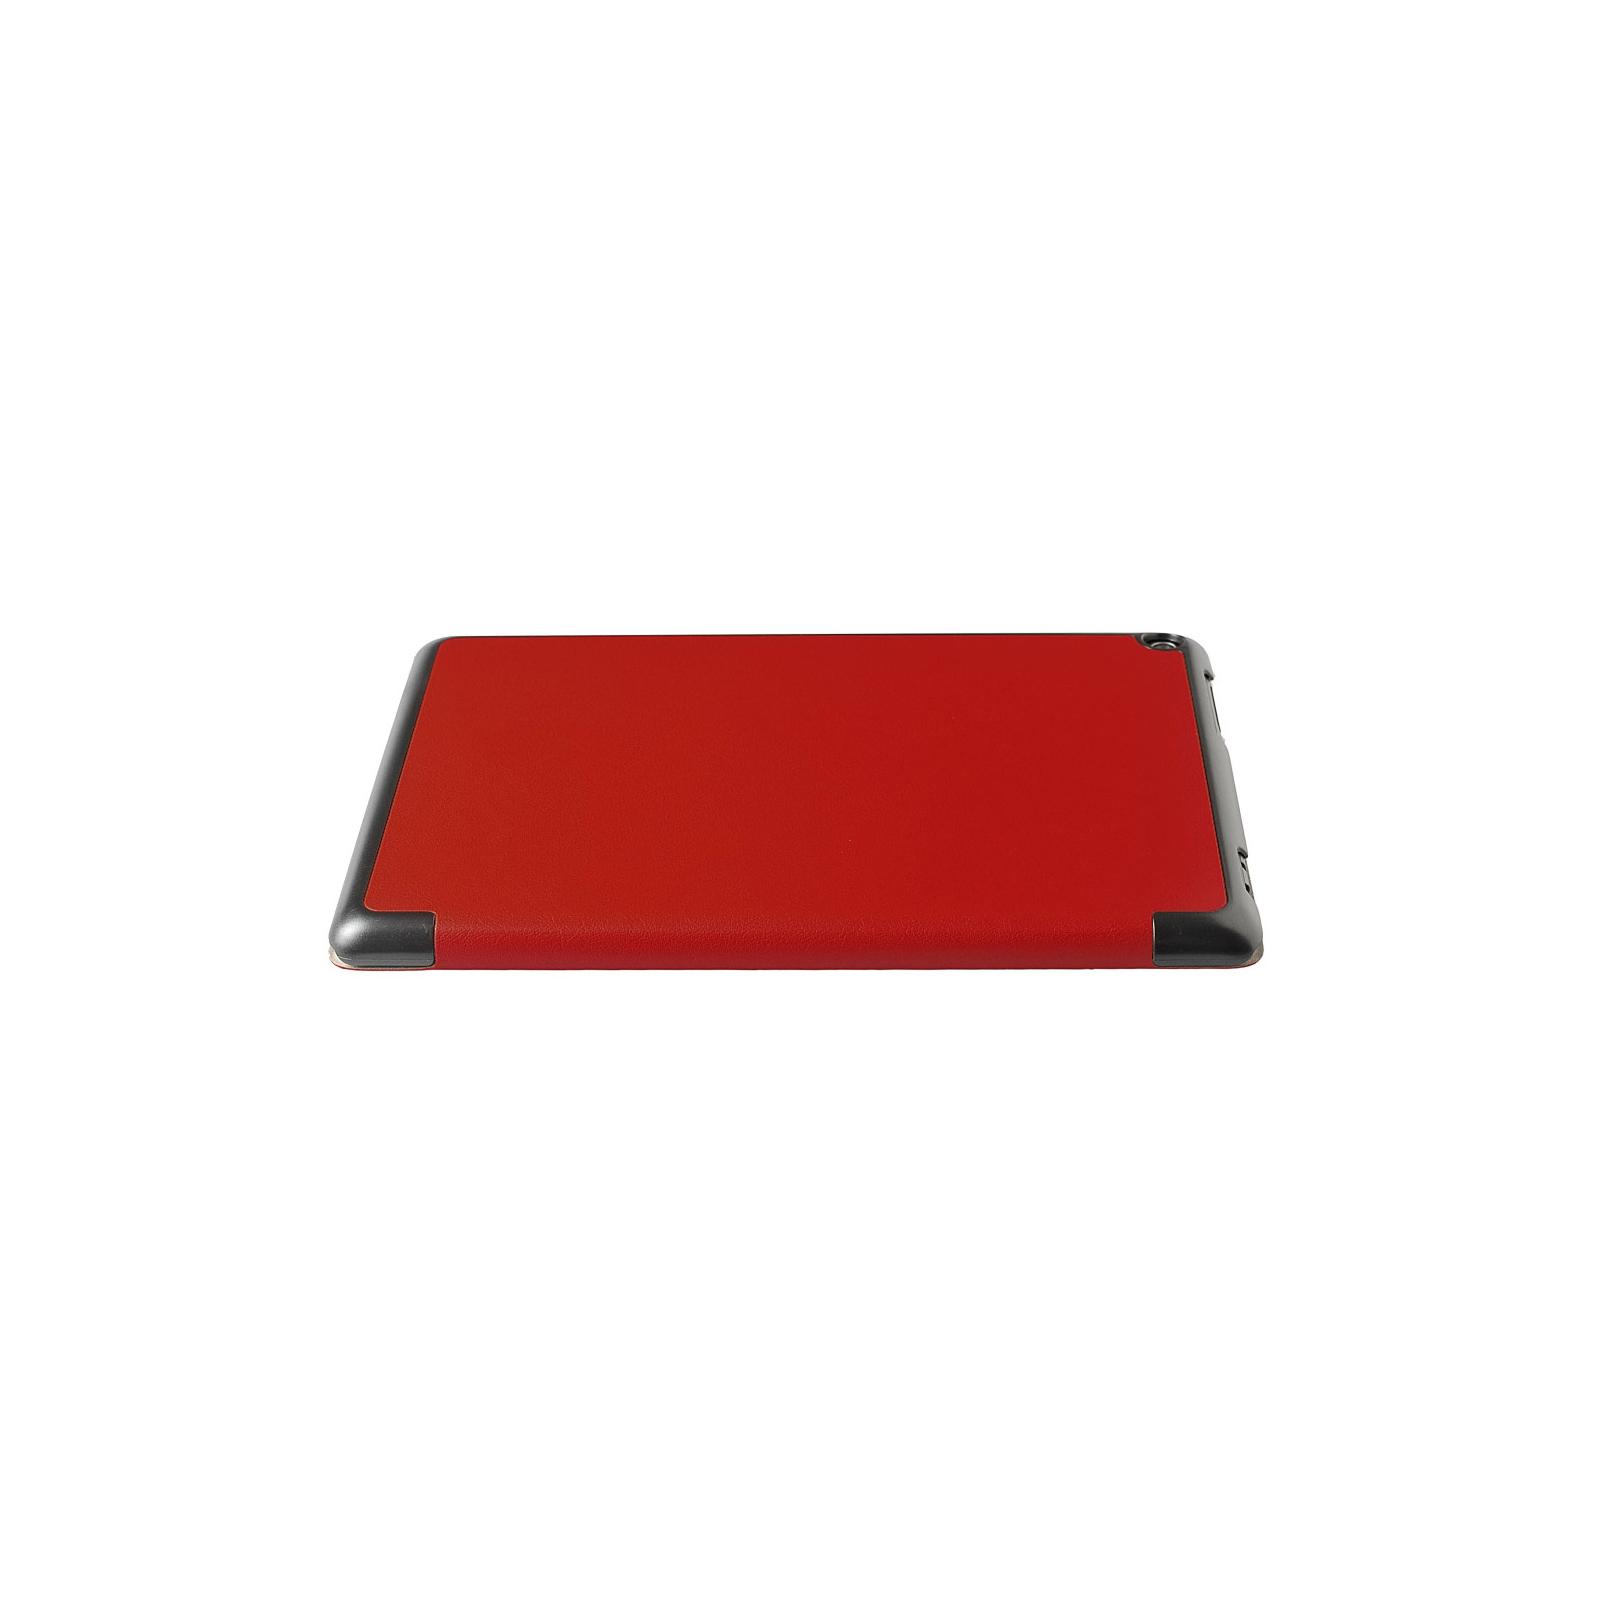 Чехол для планшета Grand-X ASUS ZenPad 10 Z300/Z300C Red (ATC - AZPZ300R) изображение 3